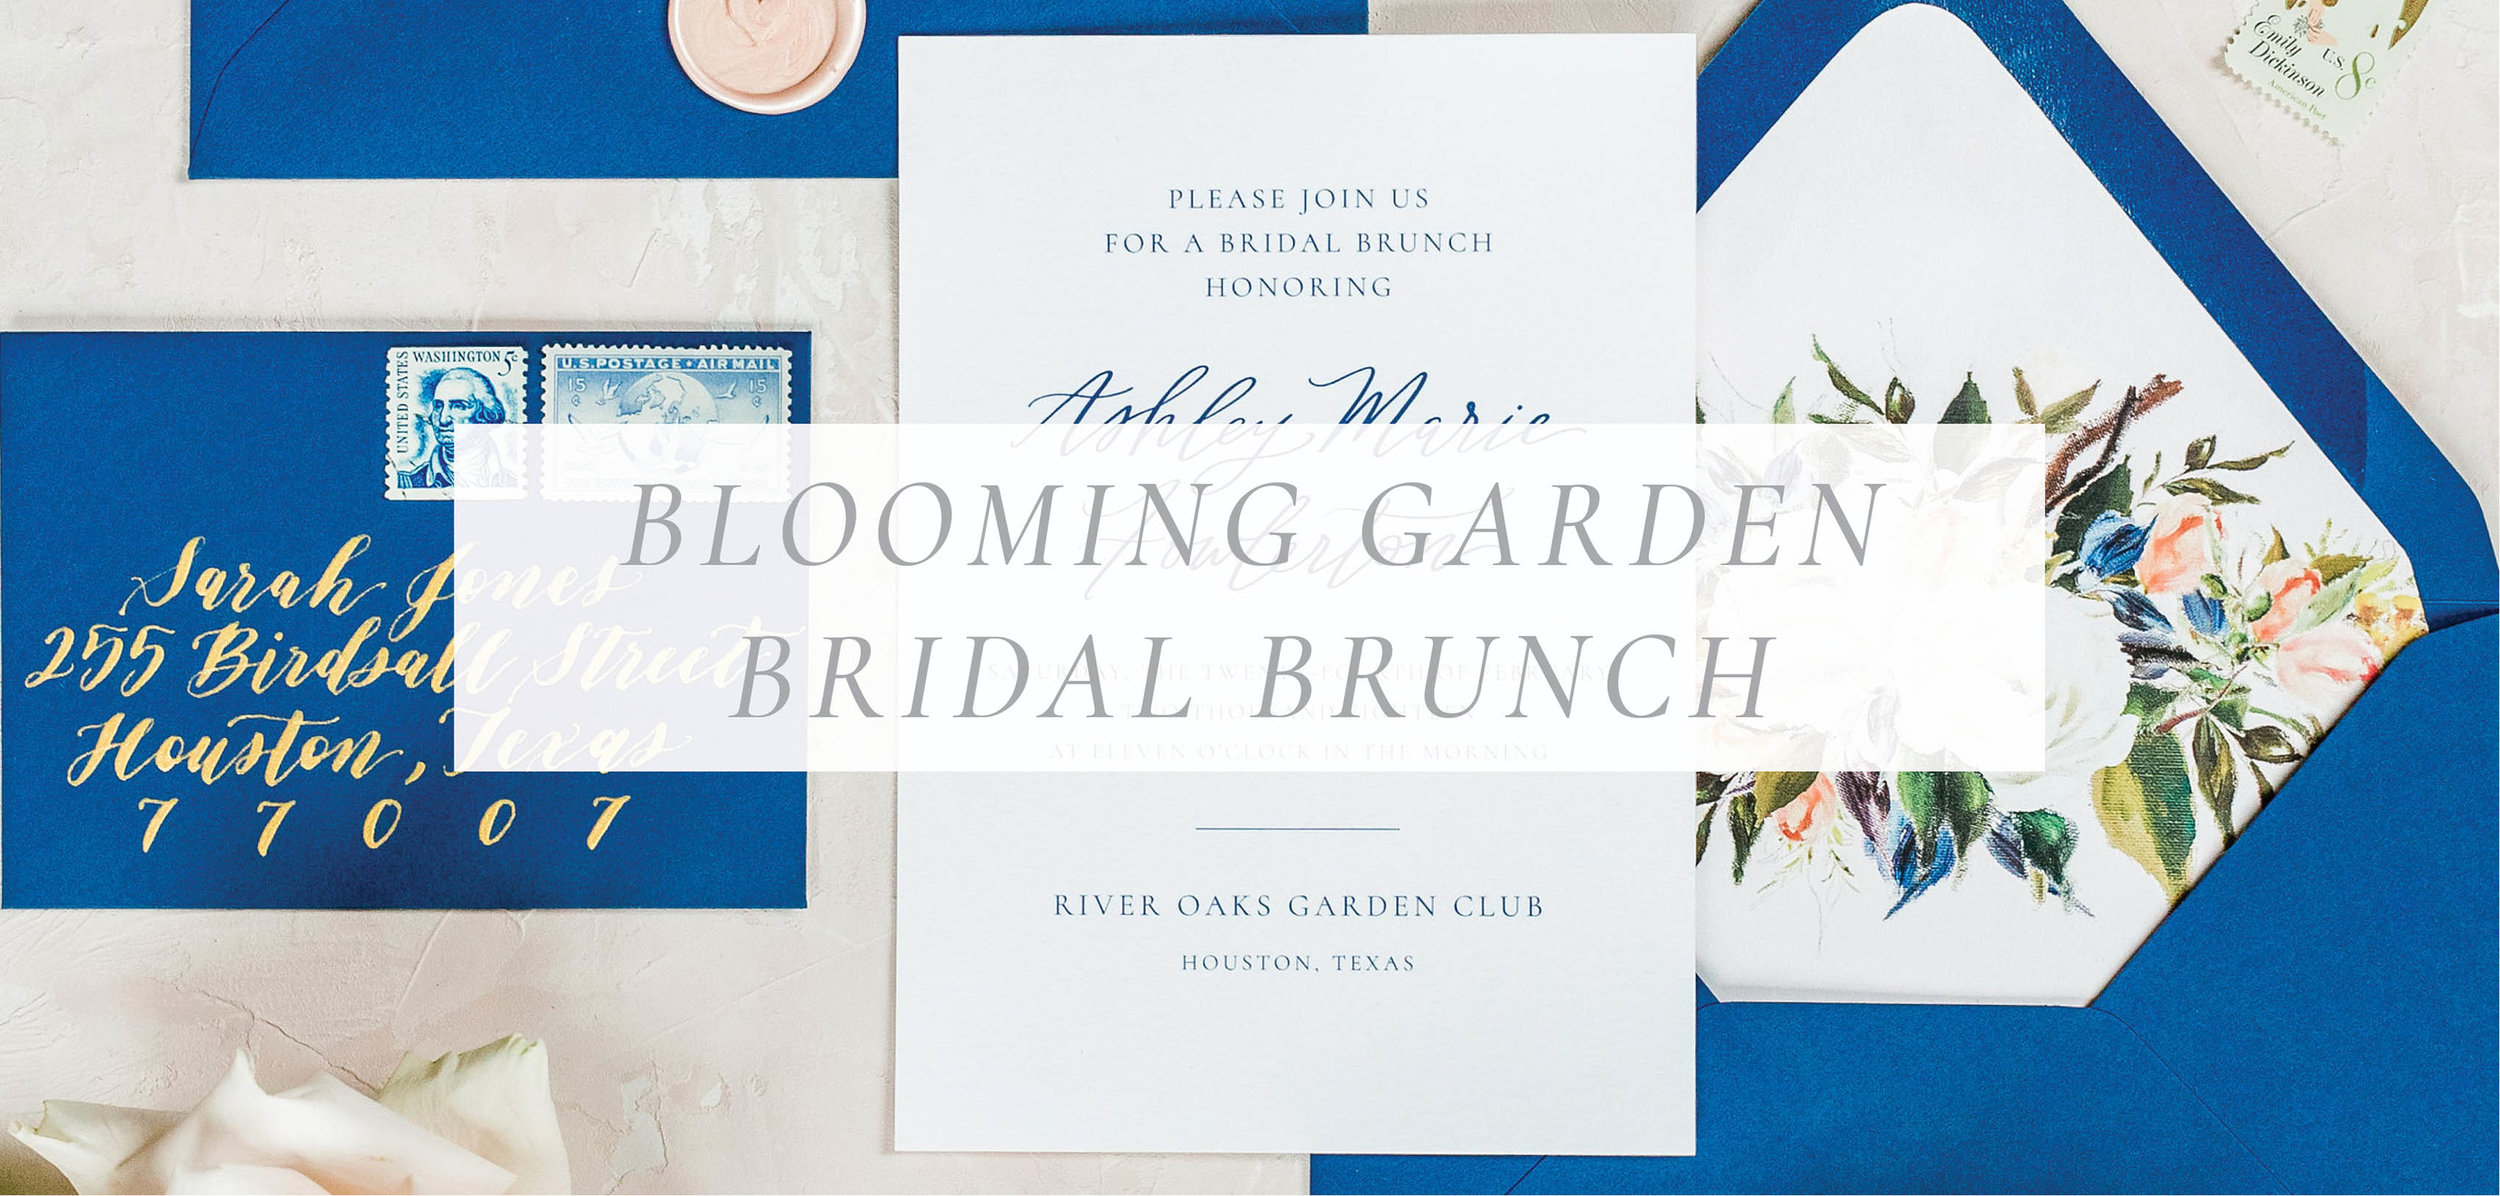 Blooming Garden Bridal Brunch.jpg